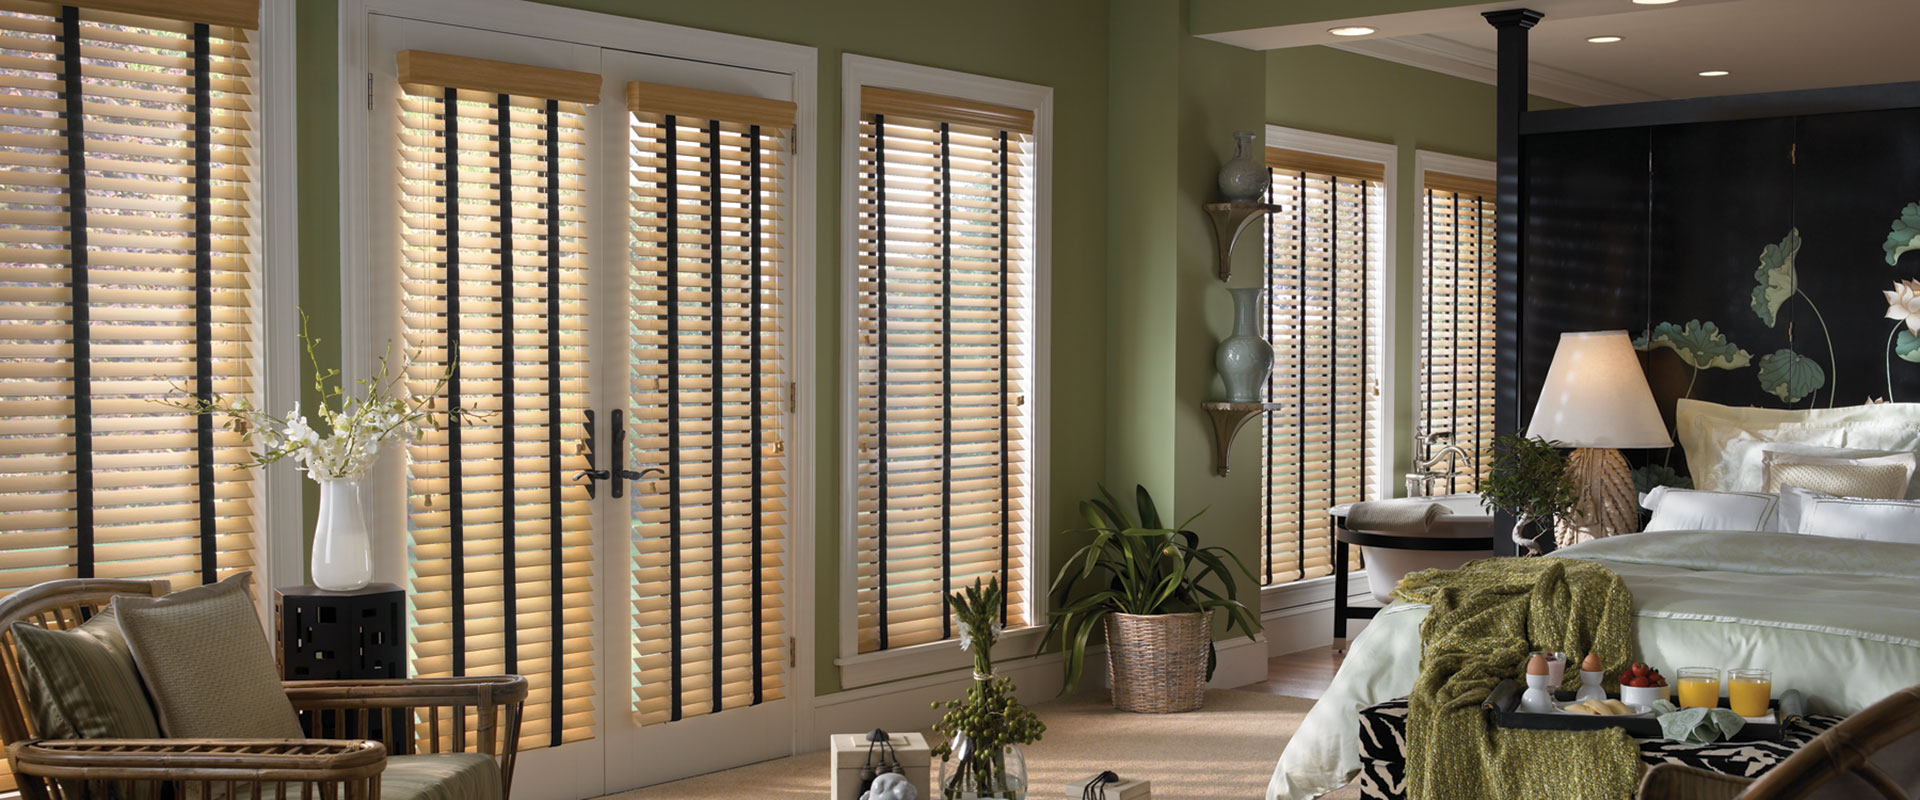 commercial-wood-blinds-top-banner.jpg